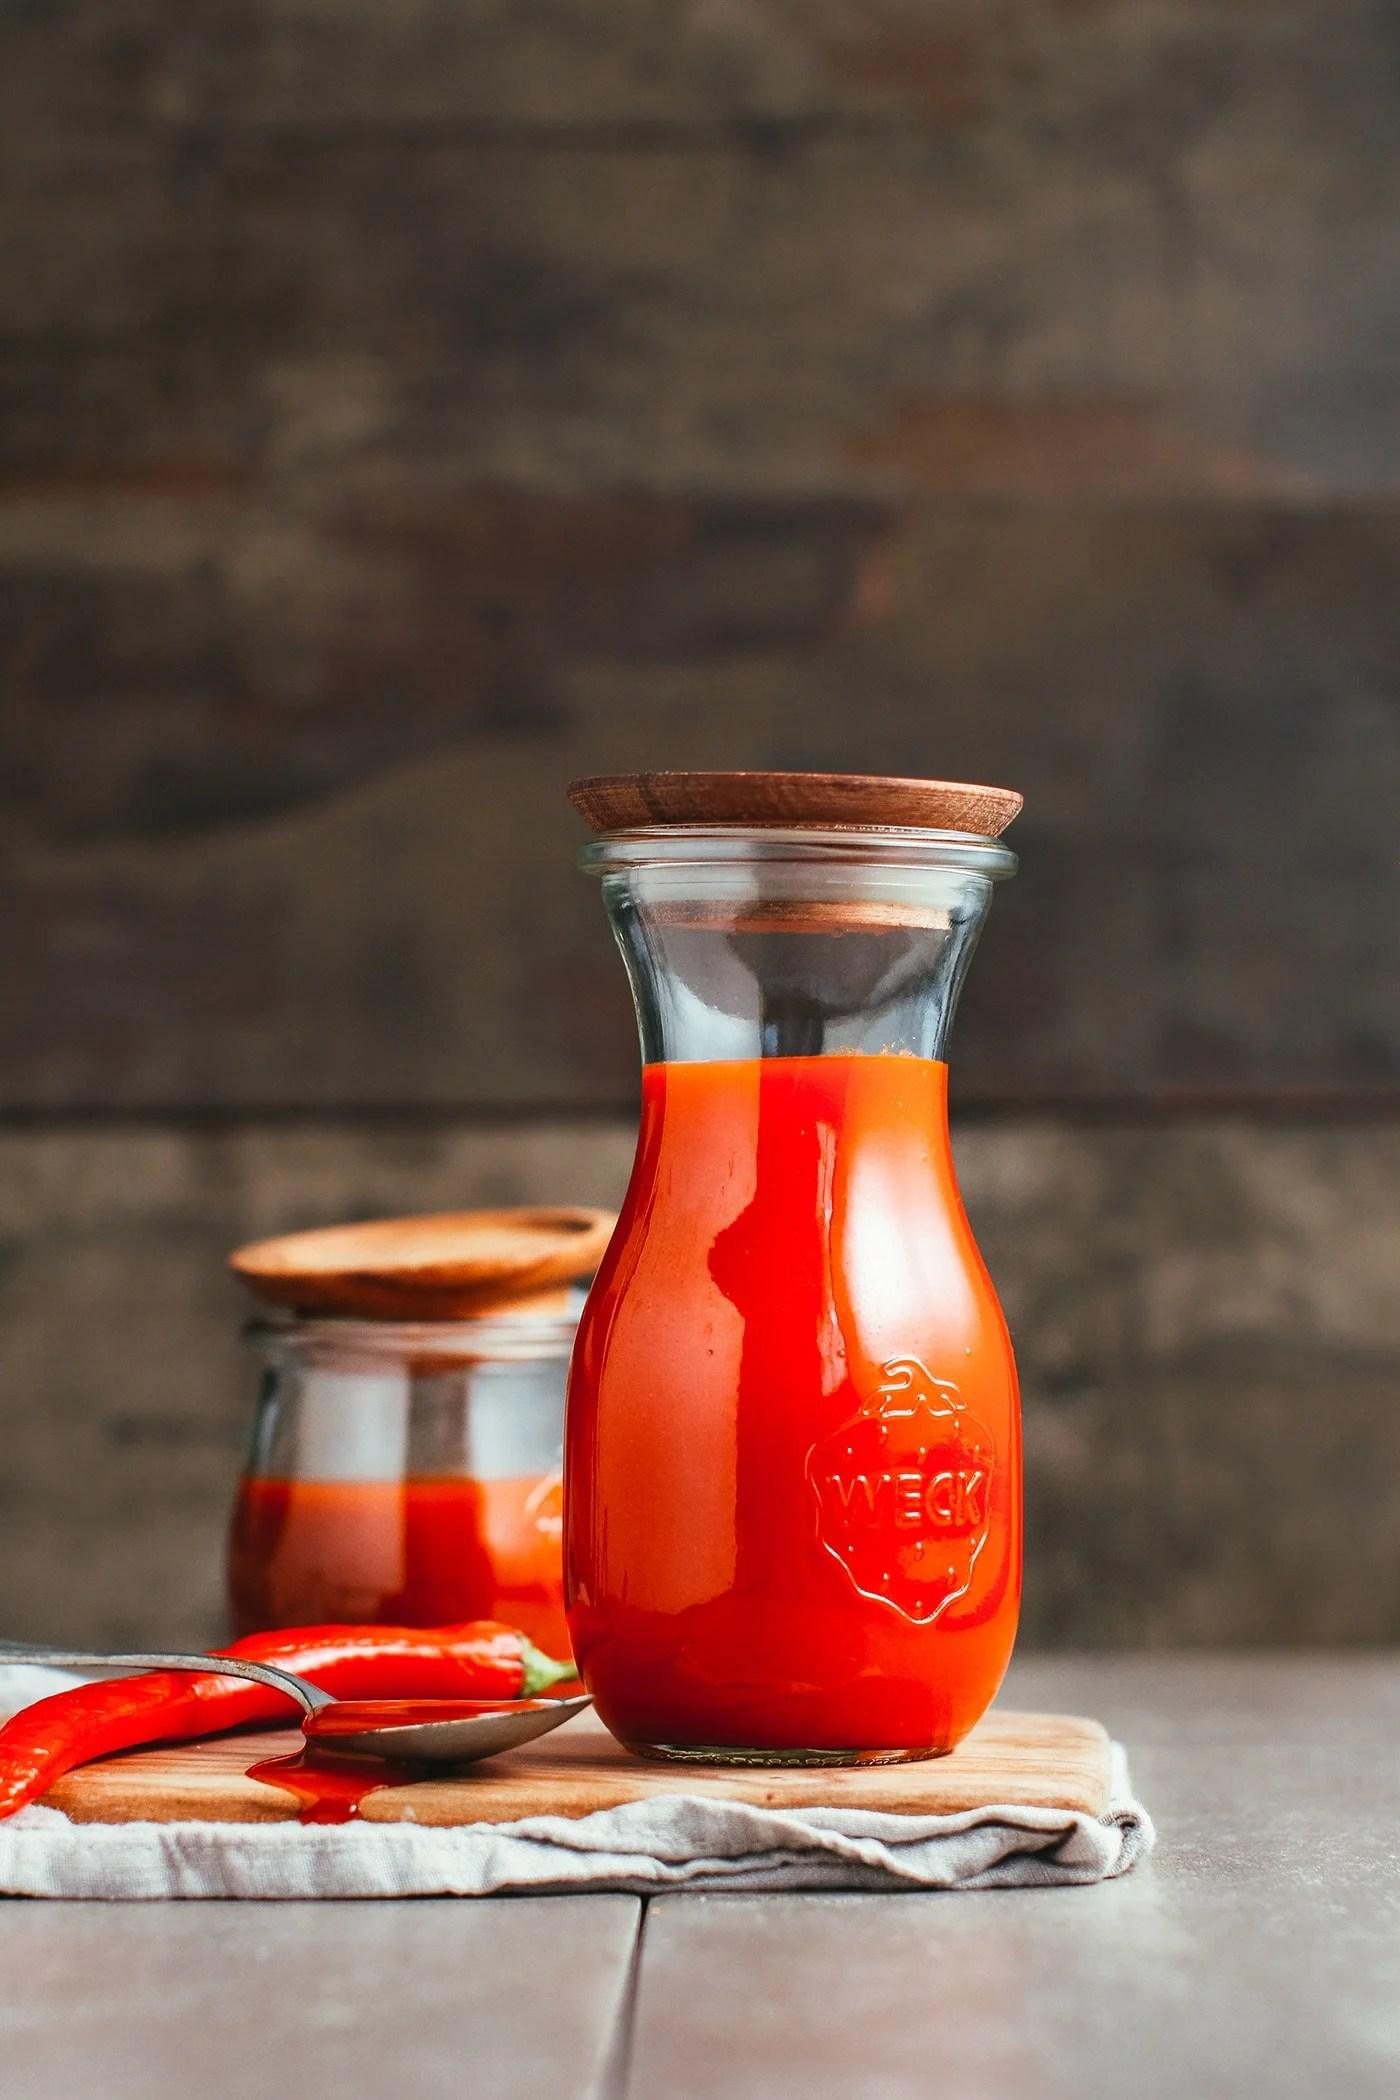 Homemade Fermented Buffalo Wings Sauce (From Scratch!)